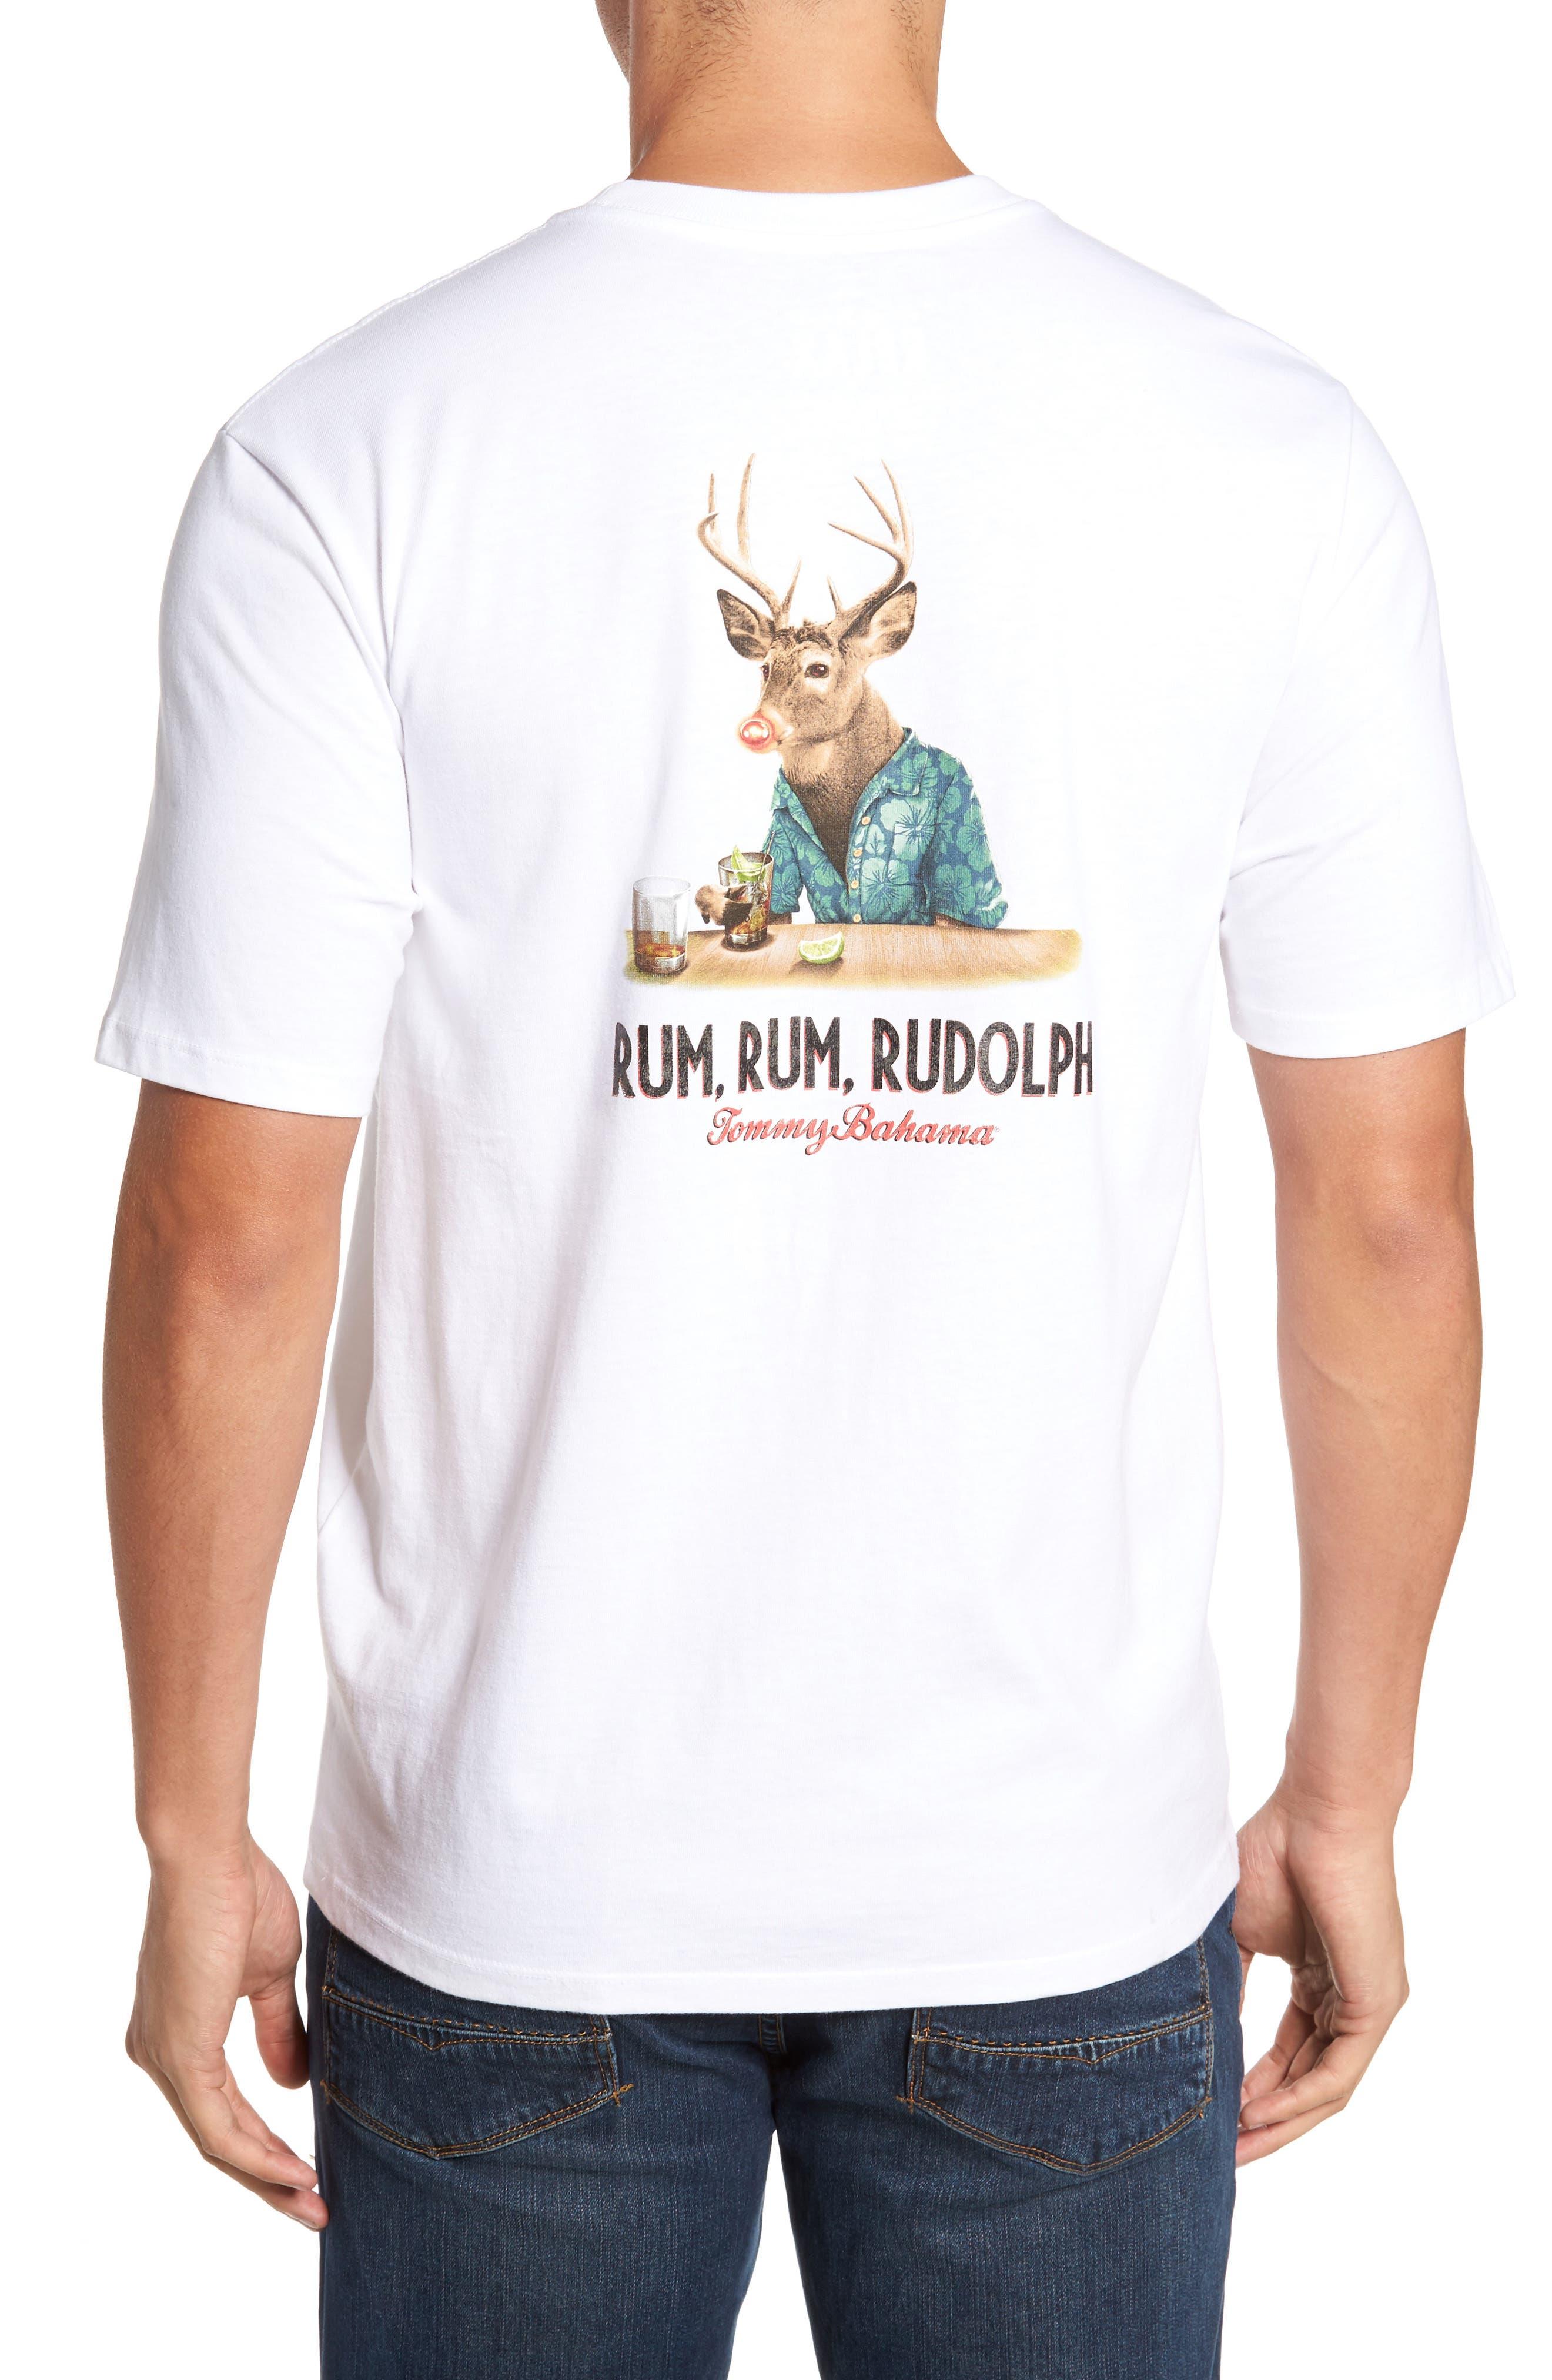 Rum Rum Rudolph T-Shirt,                             Alternate thumbnail 2, color,                             100